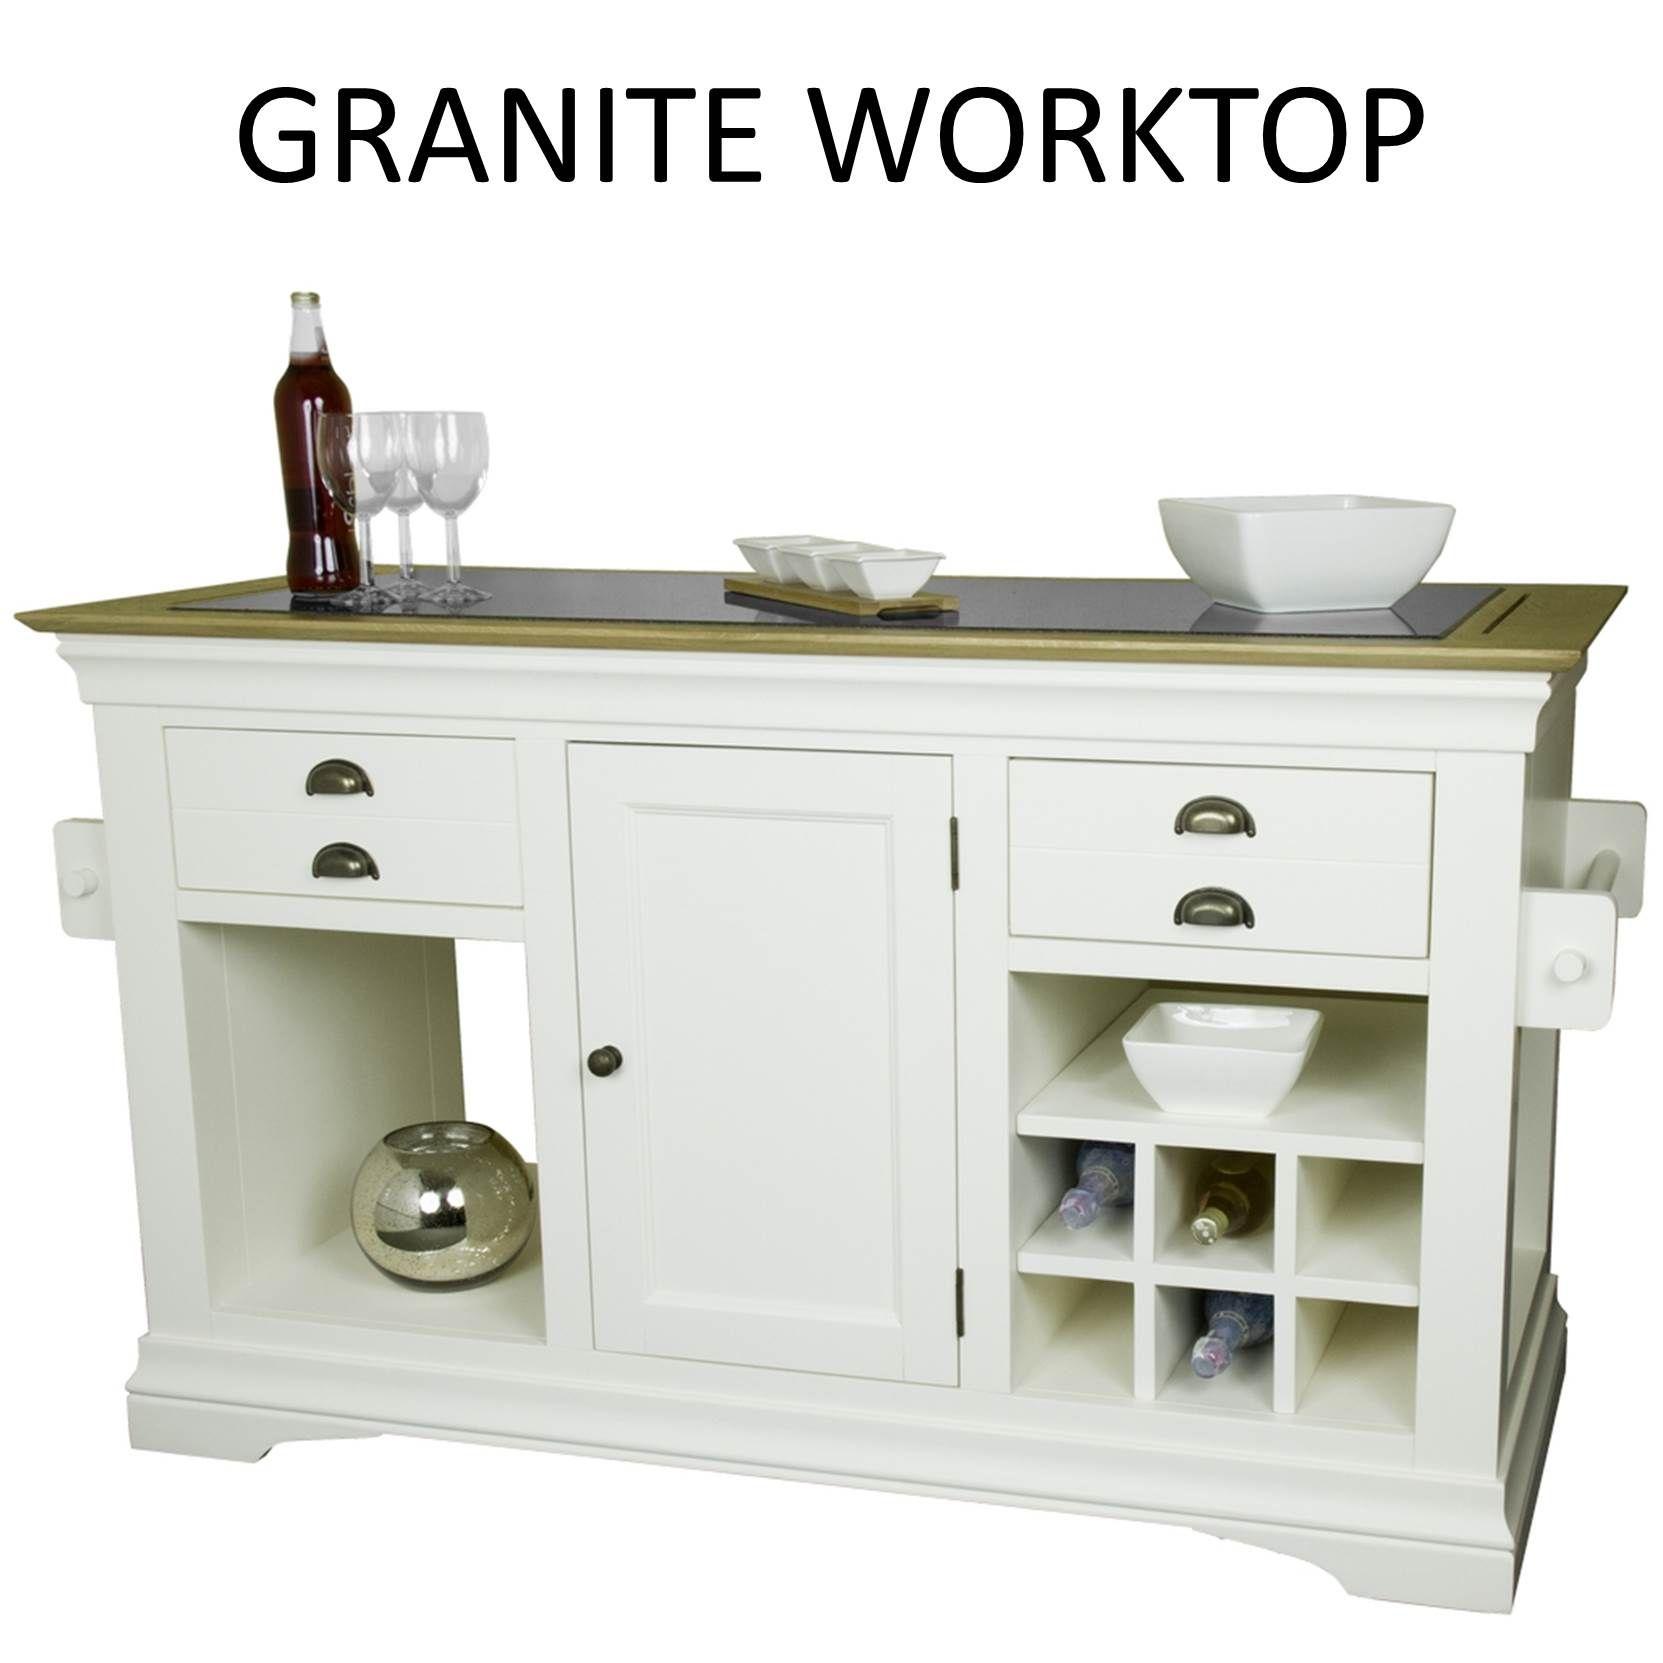 cream painted furniture large granite top kitchen island unit worktop